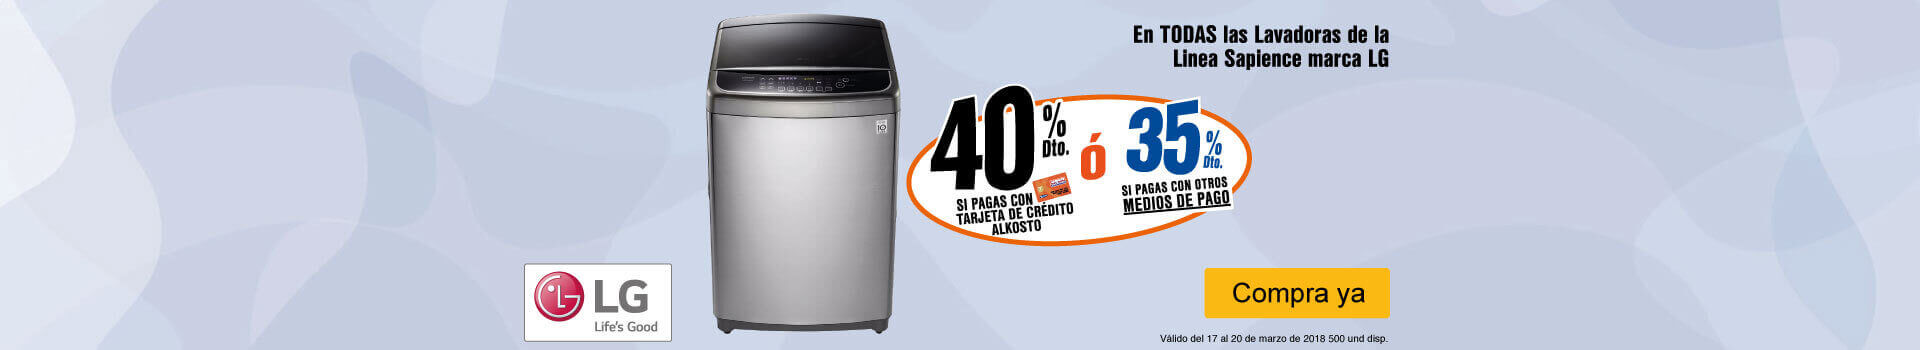 HIPER-AK-1-lb-lavadoras-lg-linea-sapience-con-tca-cat-marzo17-20